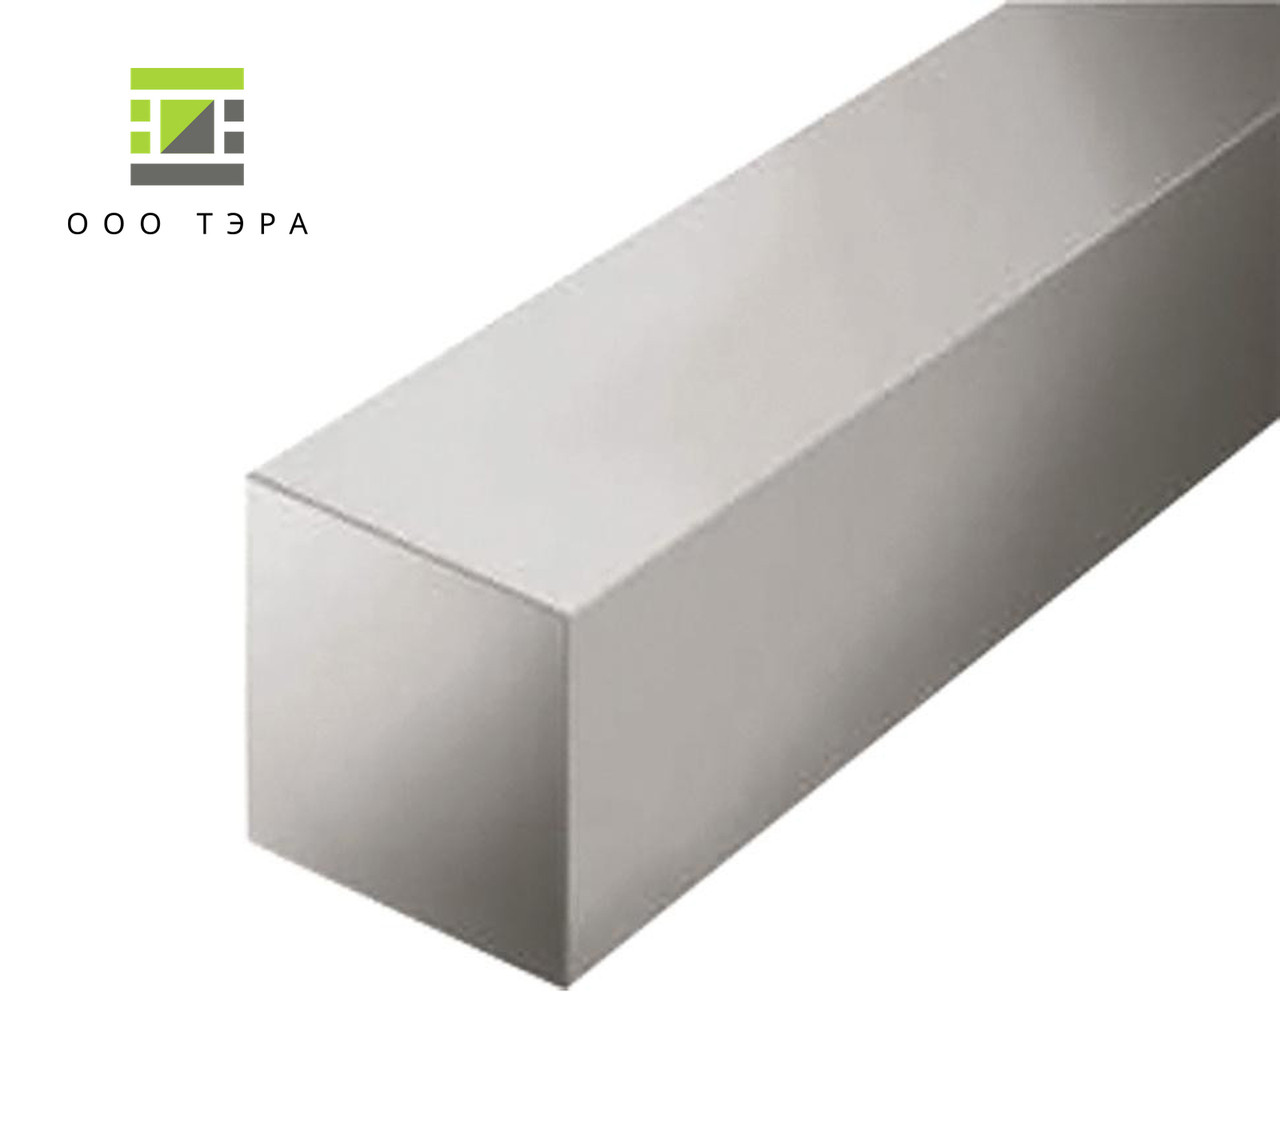 Алюминиевый квадрат 130 мм 2017 Т4 аналог Д1Т дюралевый пруток квадратный, 130х130 мм.